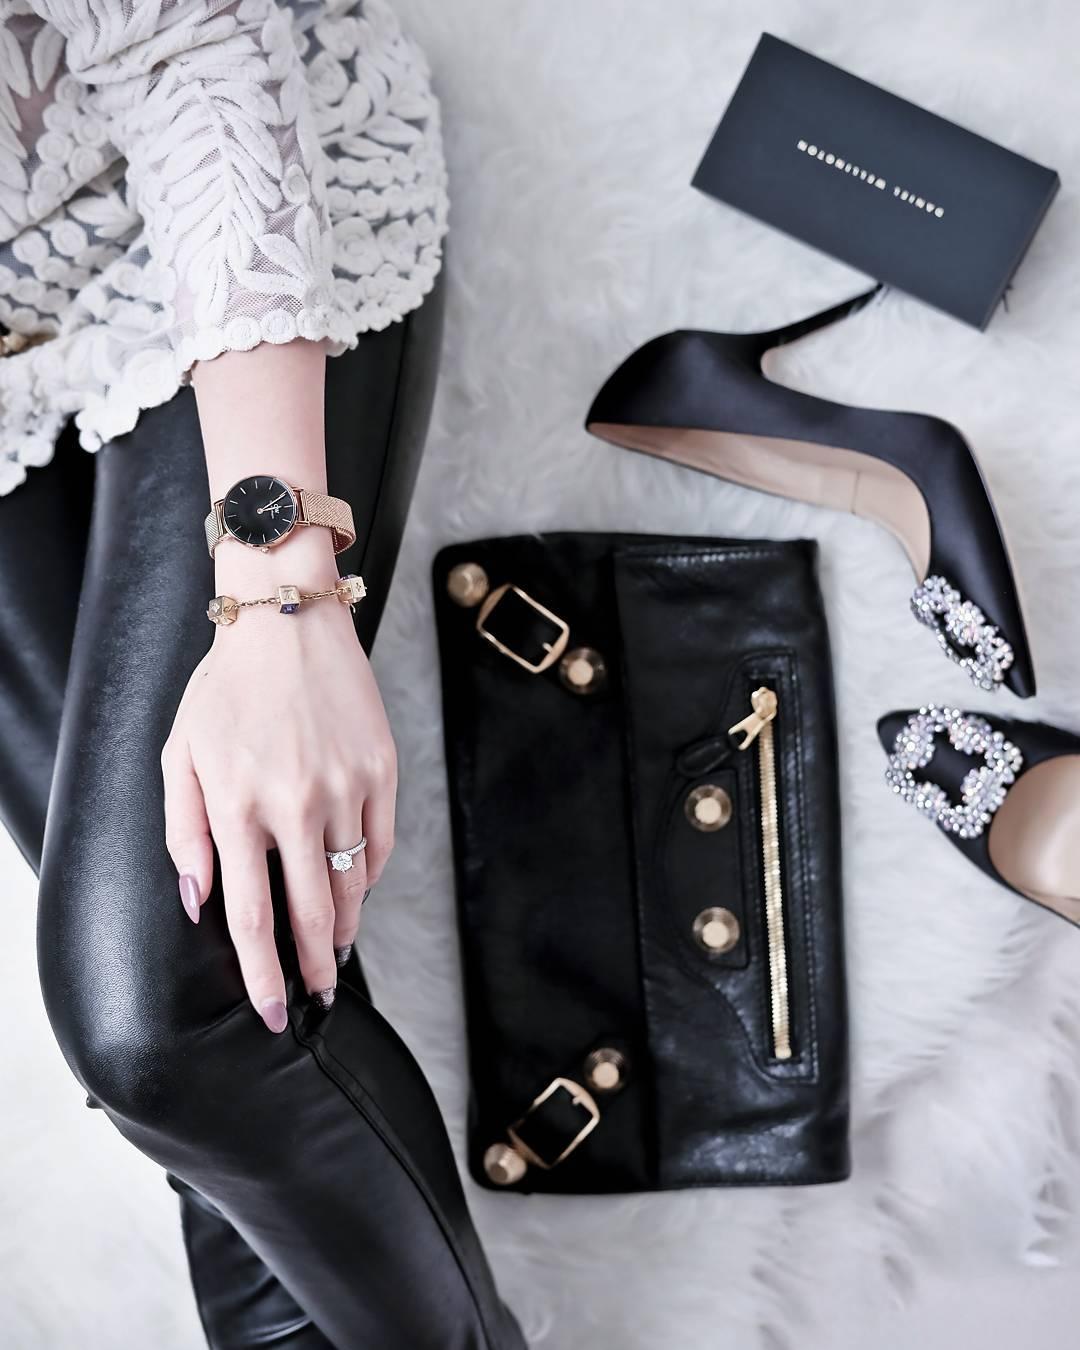 DW Daniel Wellington 丹尼爾惠靈頓 Classic Black Petite Melrose 米蘭風格時尚腕錶 DW00100161 玫瑰金 黑 32mm 4